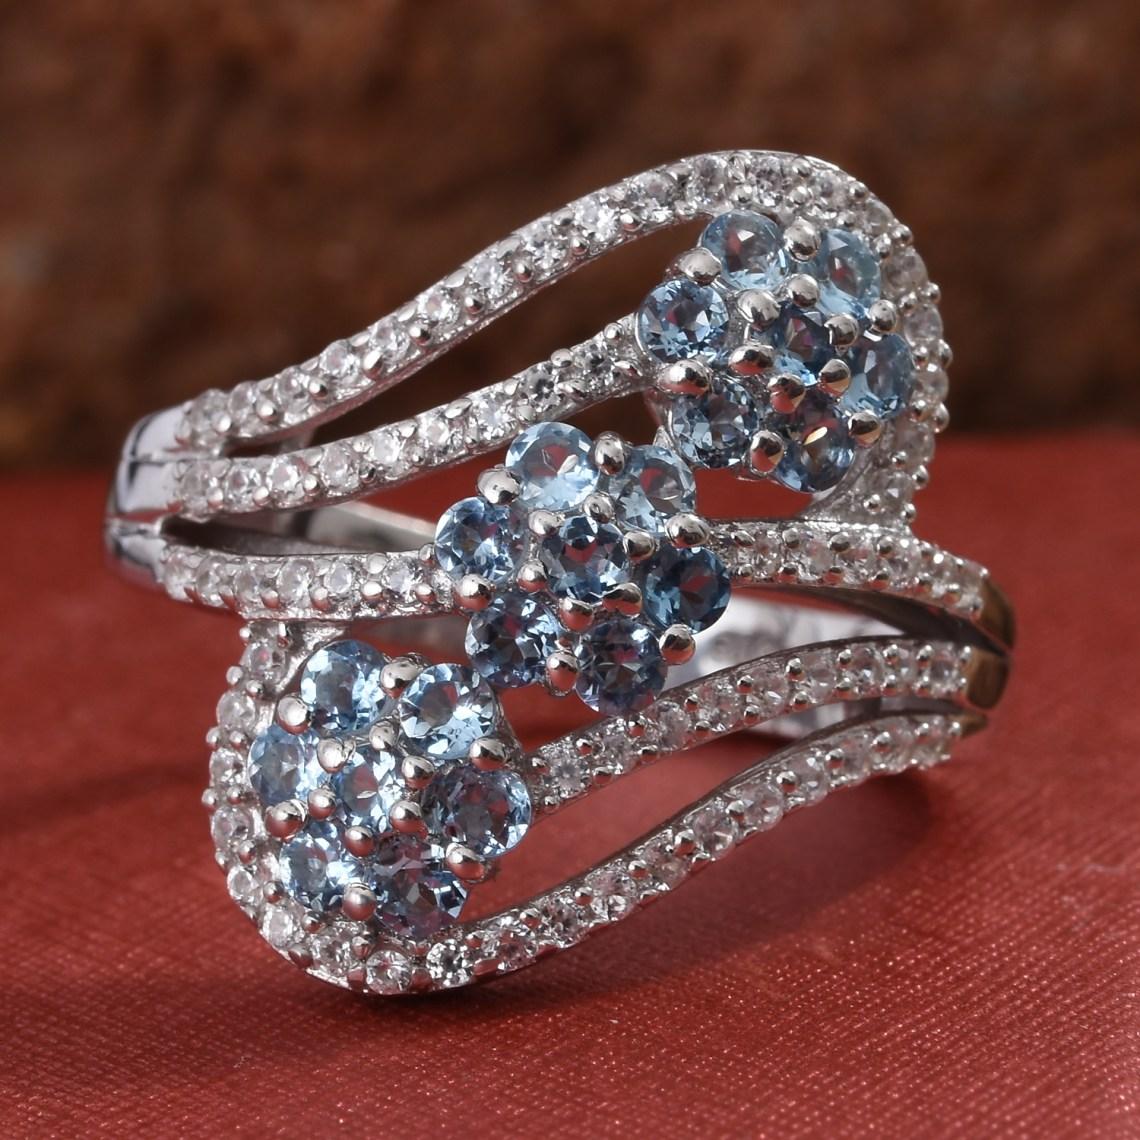 Aquamarine floral birthstone ring.